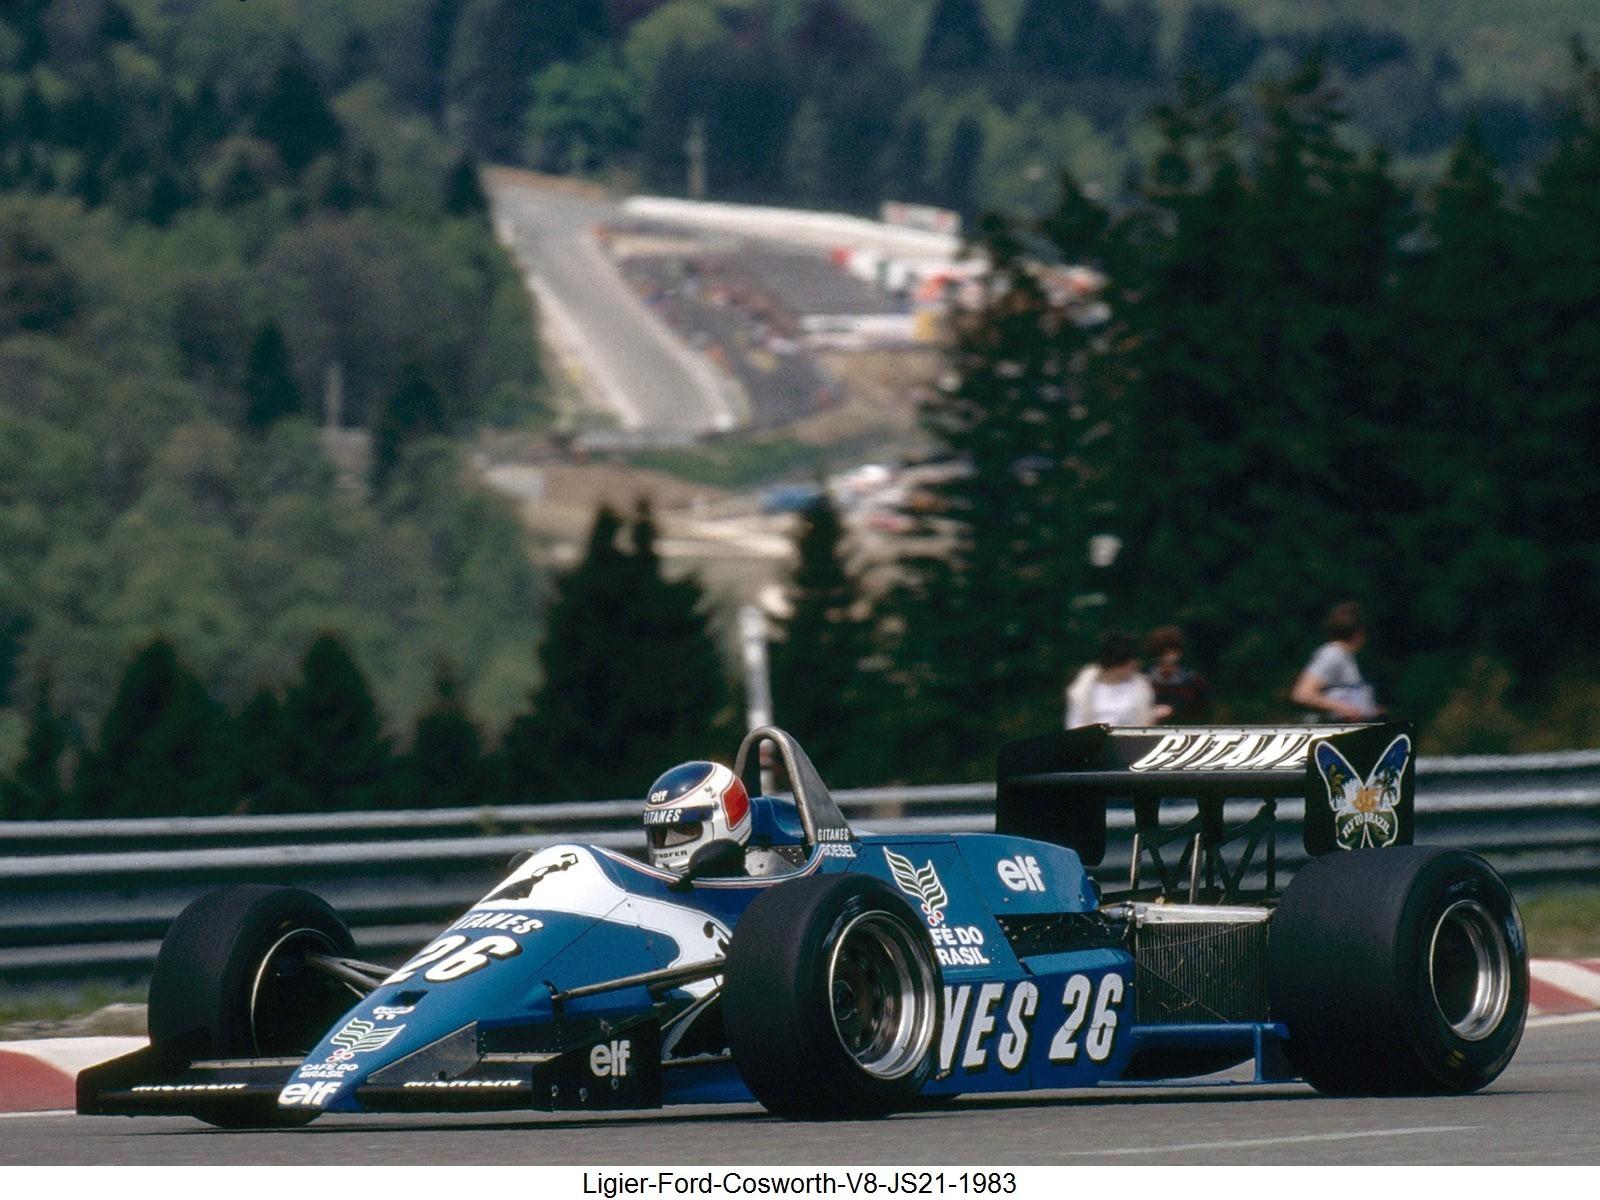 Ligier Ford Cosworth V8 JS21 1983